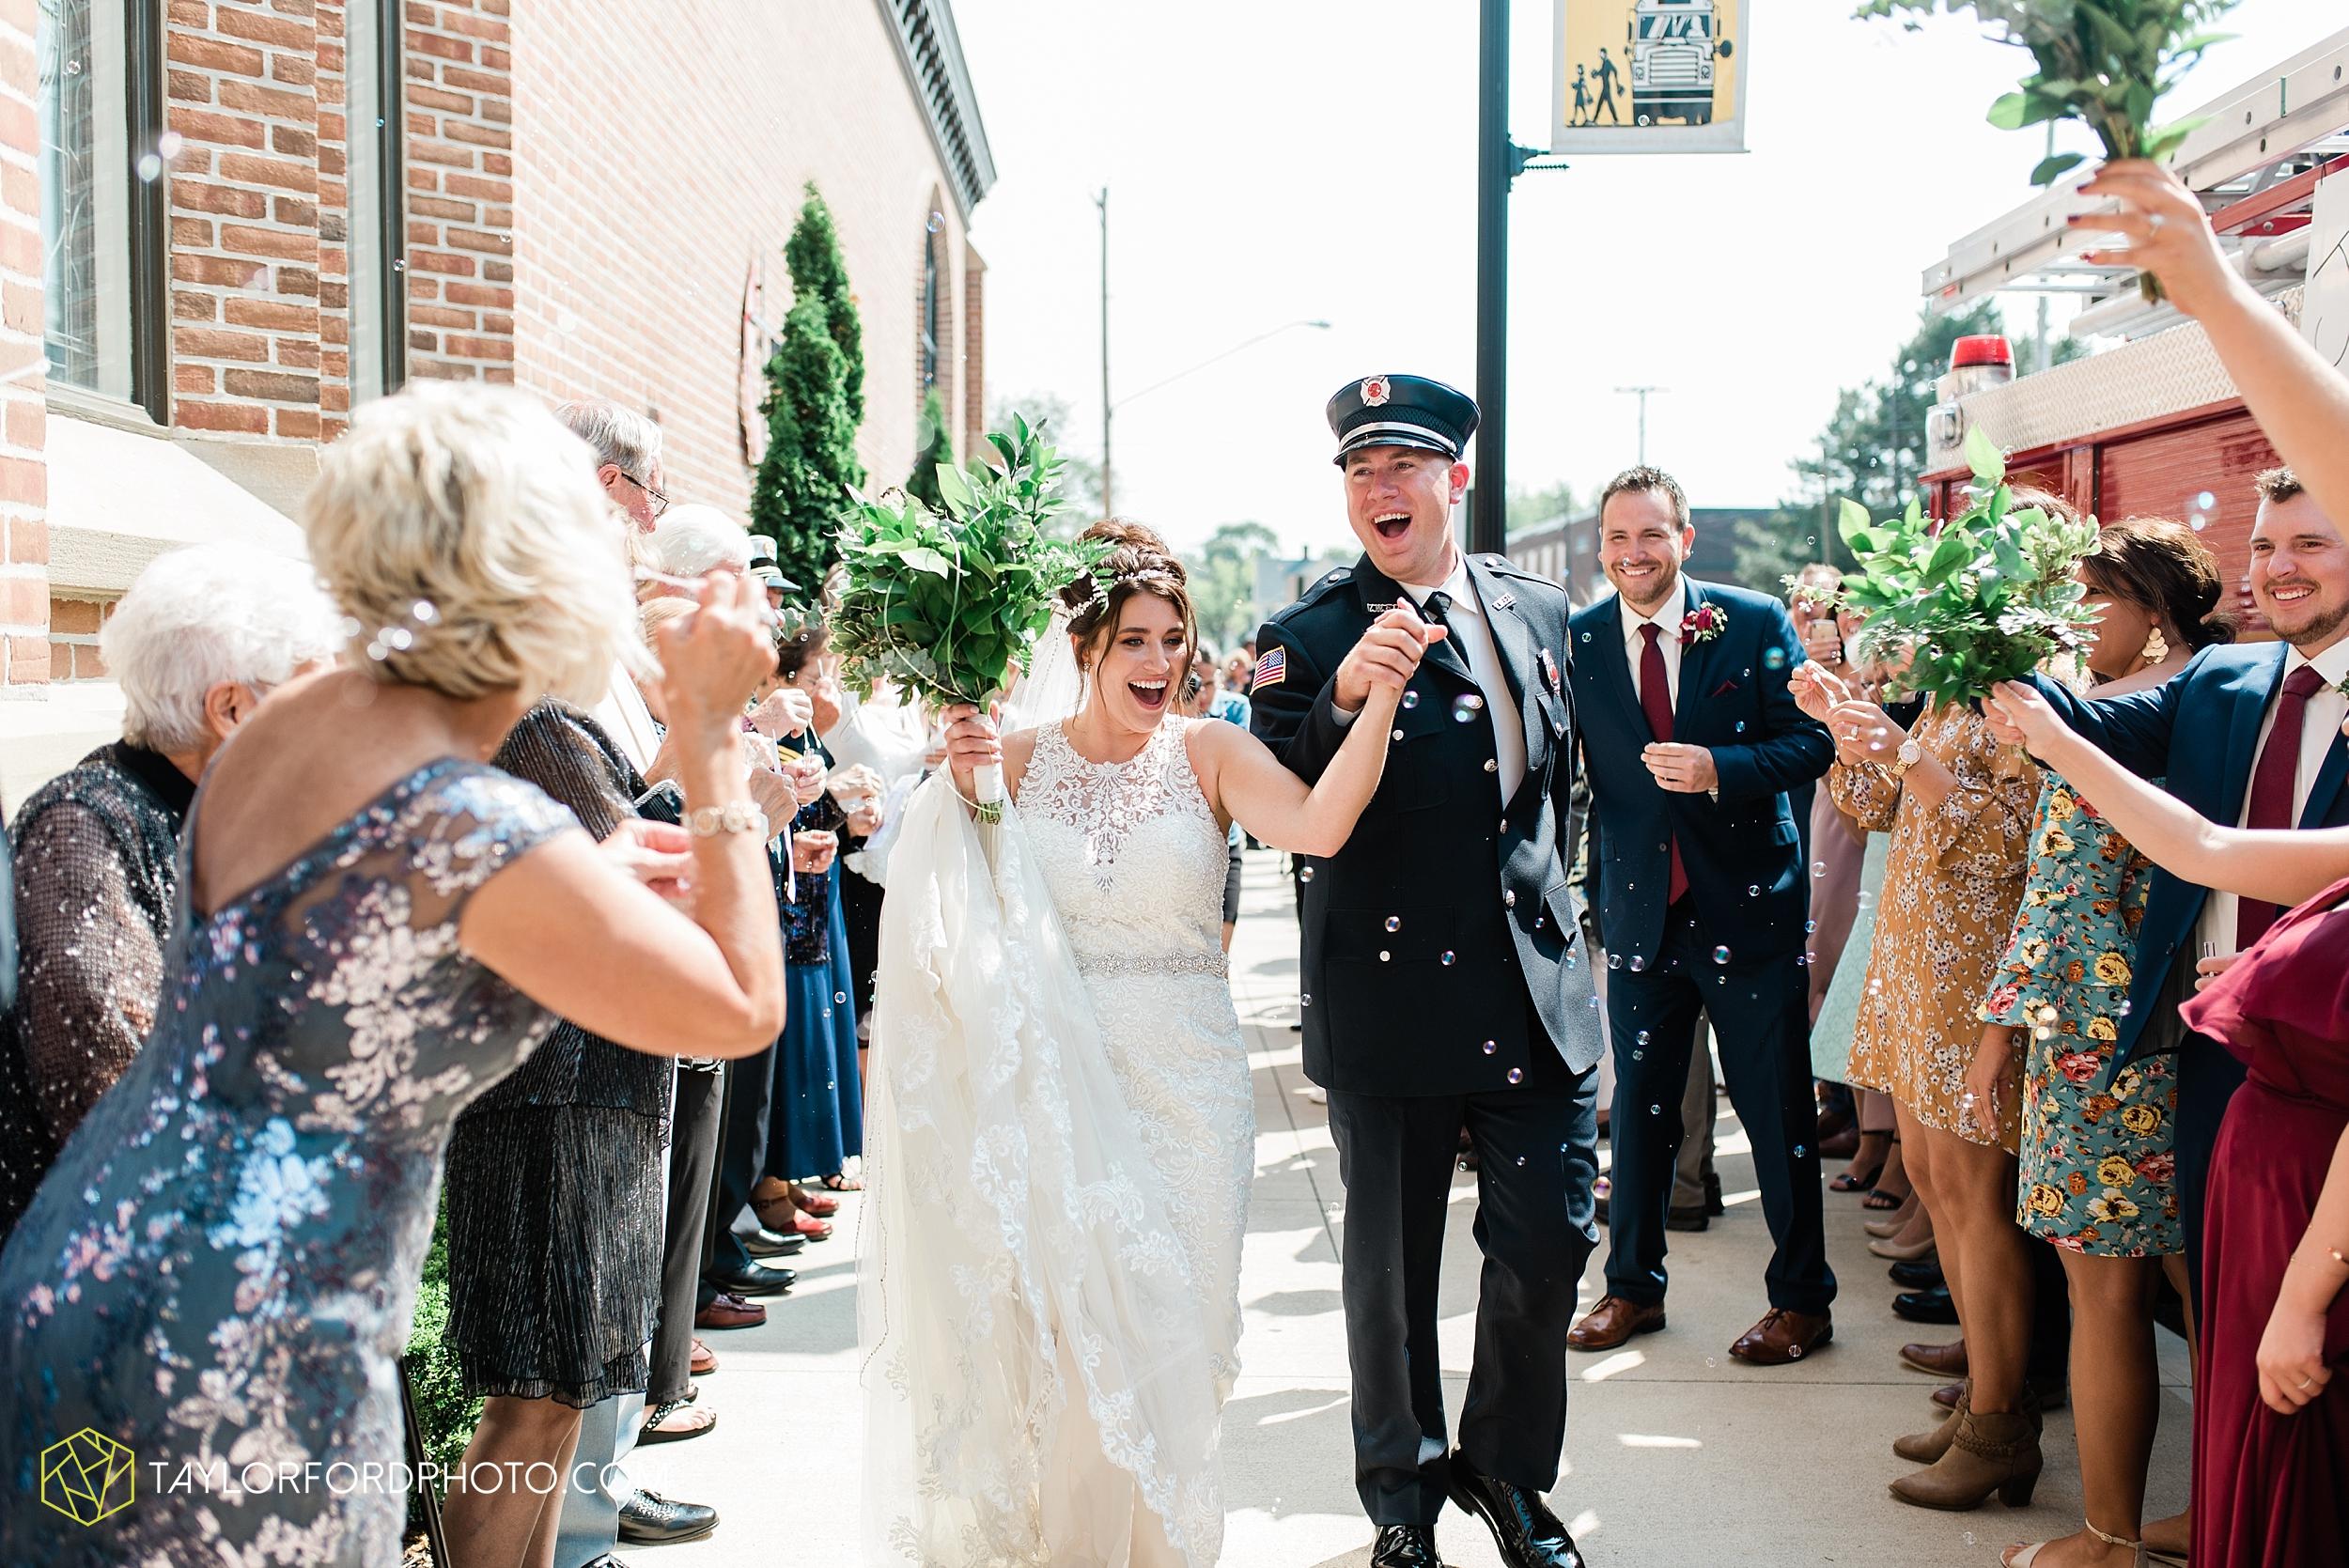 van-wert-ohio-first-united-methodist-church-county-dairy-barn-wedding-photographer-taylor-ford-photography_9840.jpg